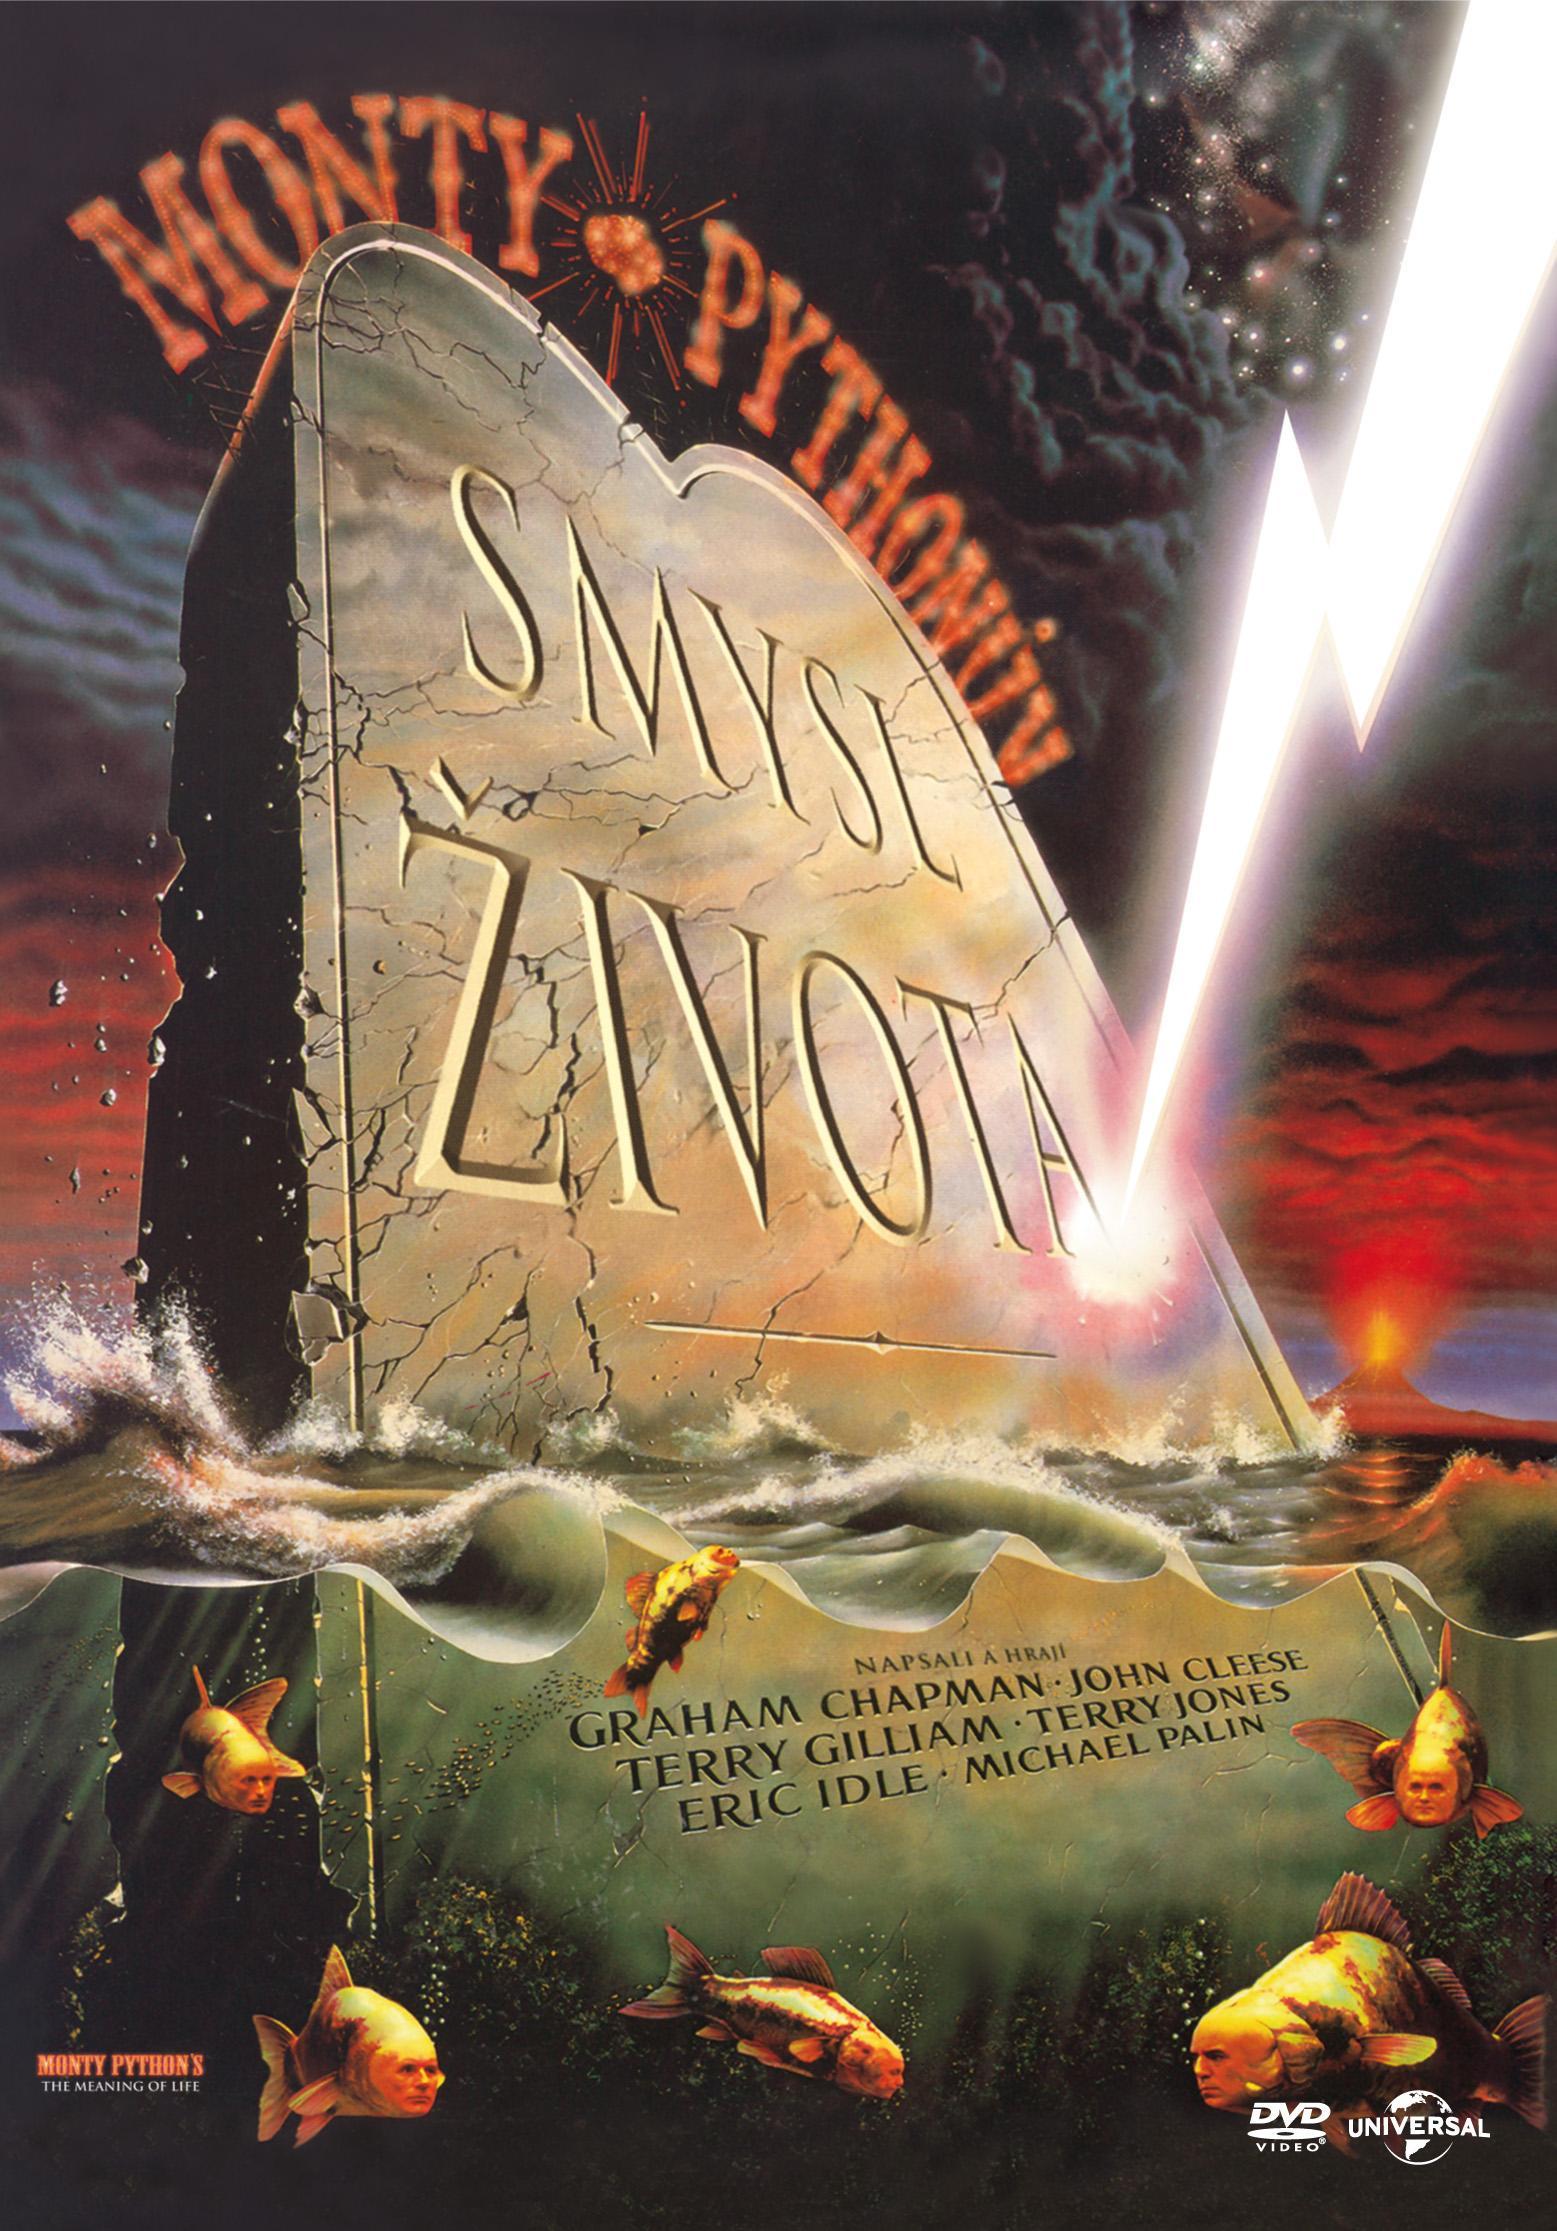 MONTY PYTHON: SMYSL ŽIVOTA - DVD